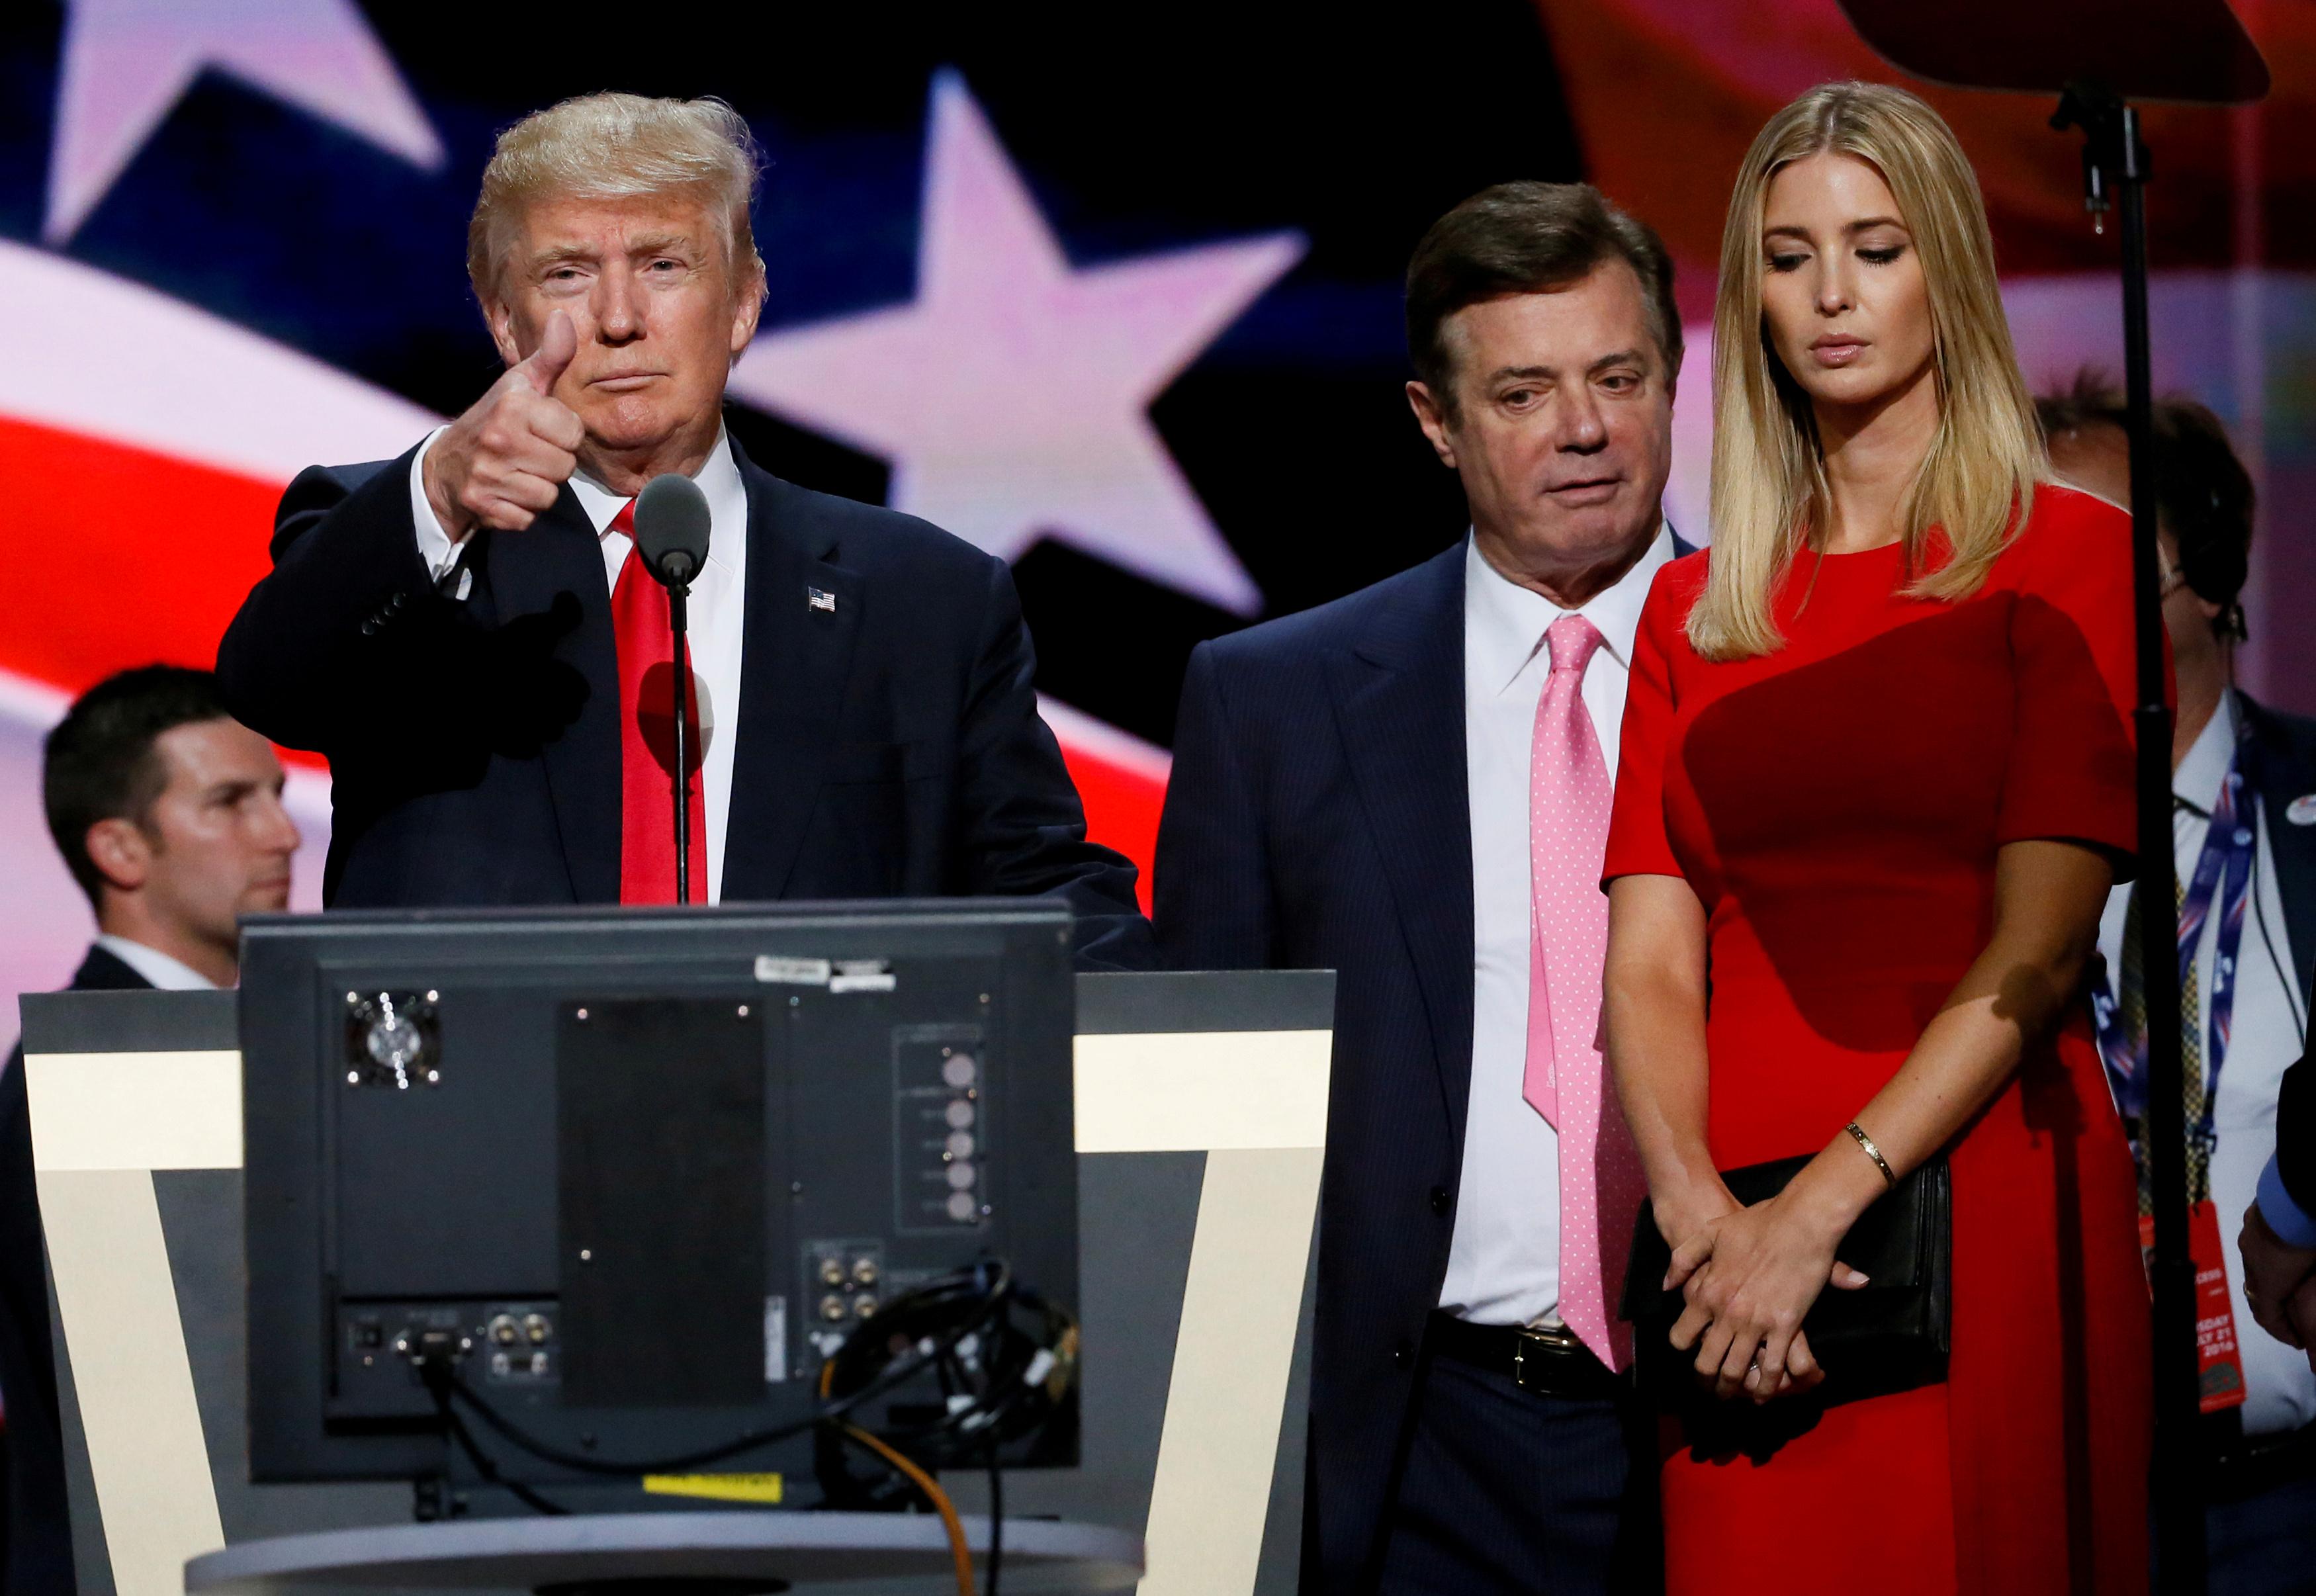 Donald Trump, Paul Manafort, Ivanka Trump